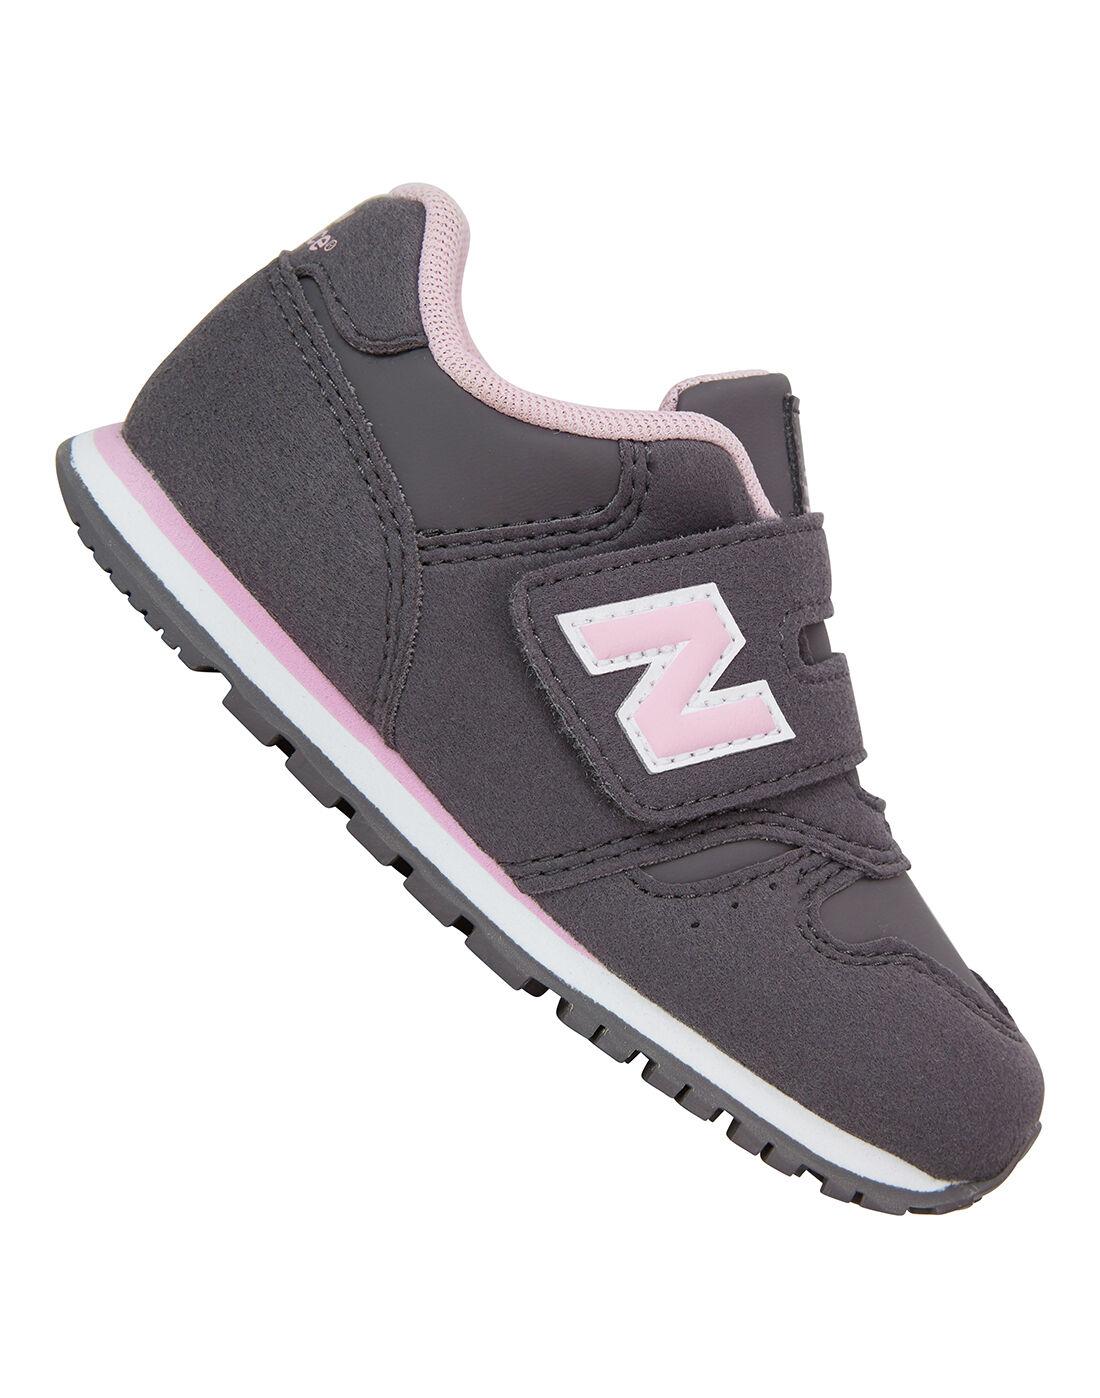 New Balance Infant Girls 373 Trainer - Grey | Life Style Sports EU